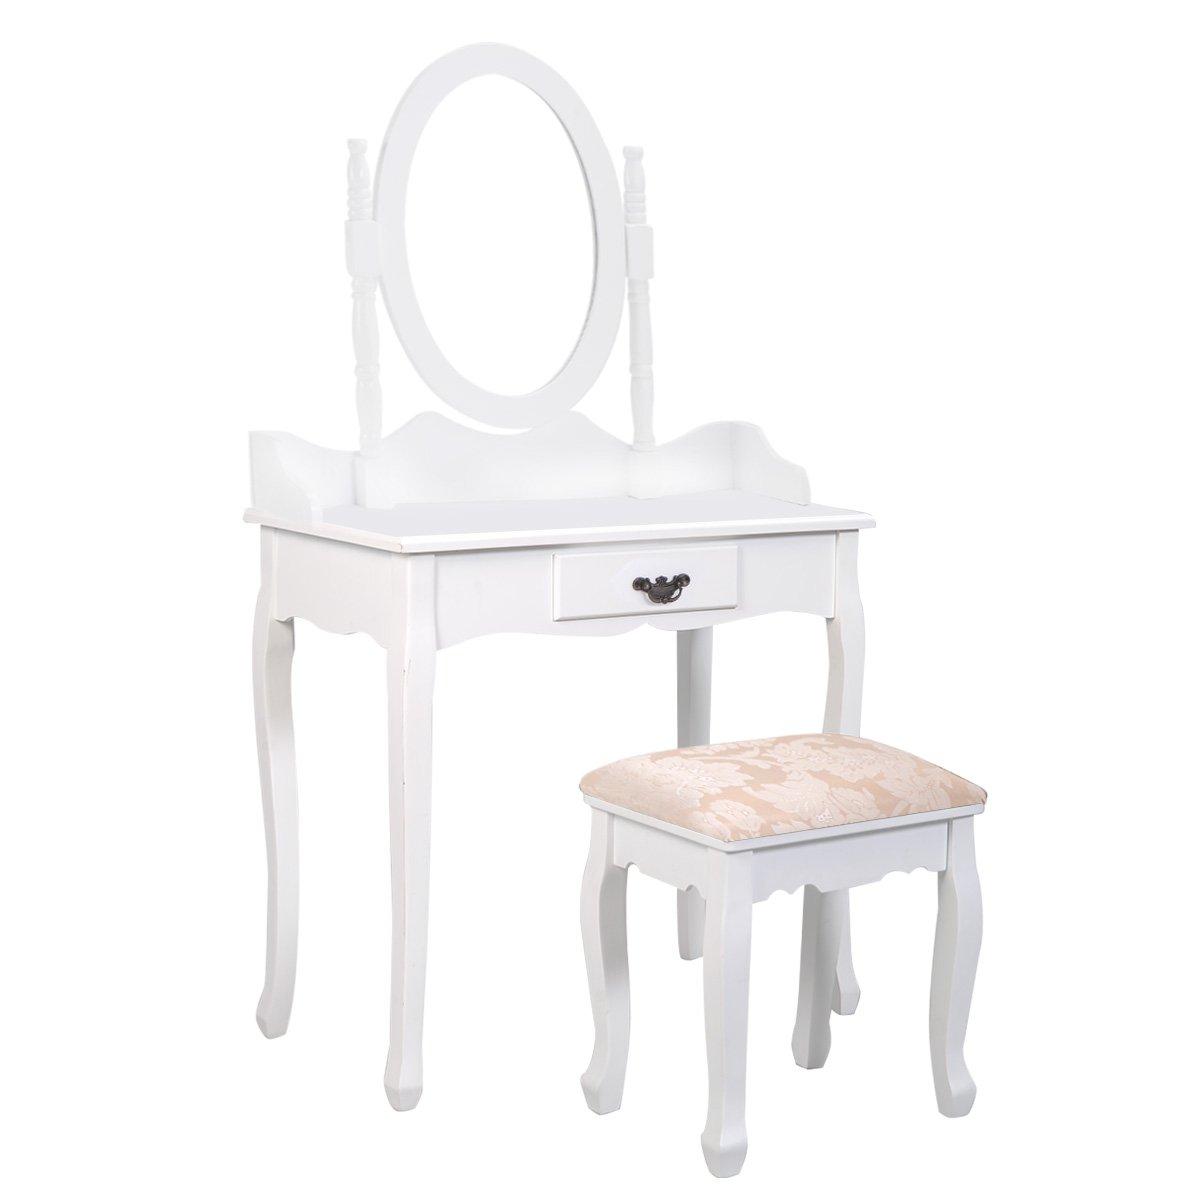 white and gold vanity table. Giantex White Bathroom Vanity Jewelry Makeup Dressing Table Set W Stool  Mirror Wood Desk Vanities Benches Amazon com